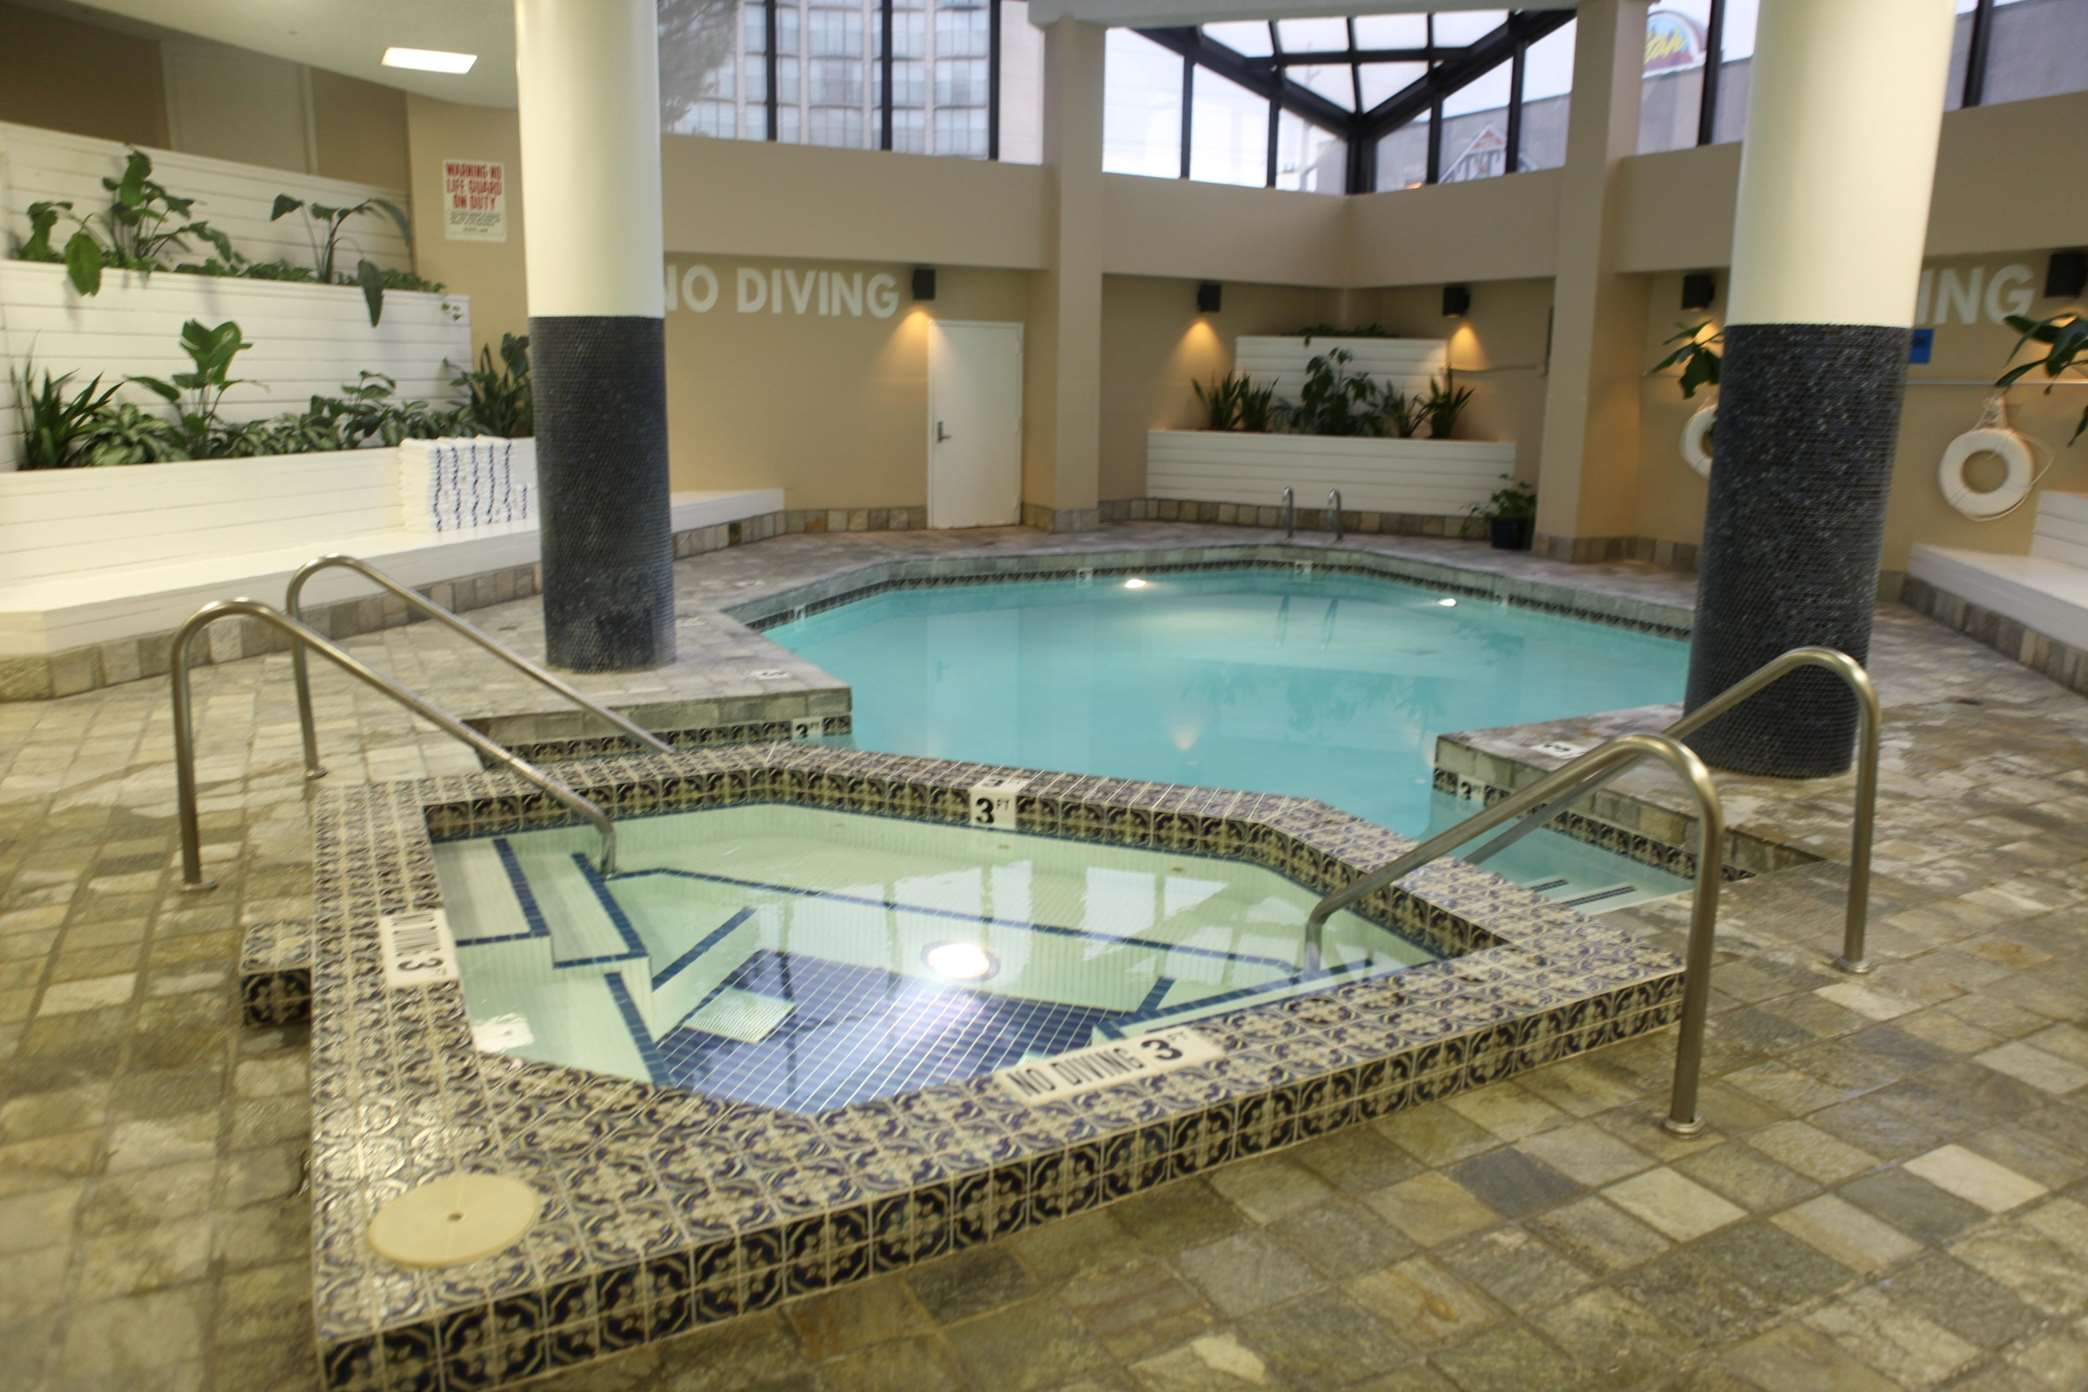 Doubletree Suites By Hilton Hotel Salt Lake City Downtown